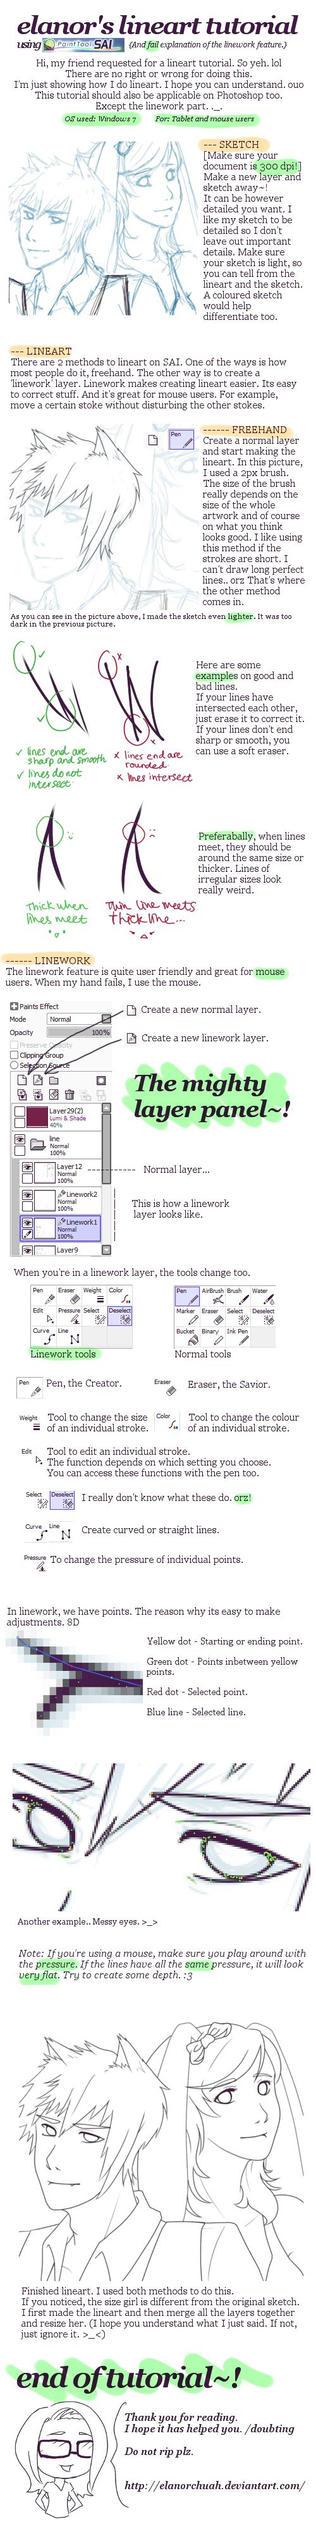 Lineart Tutorial using SAI by elanorchuah